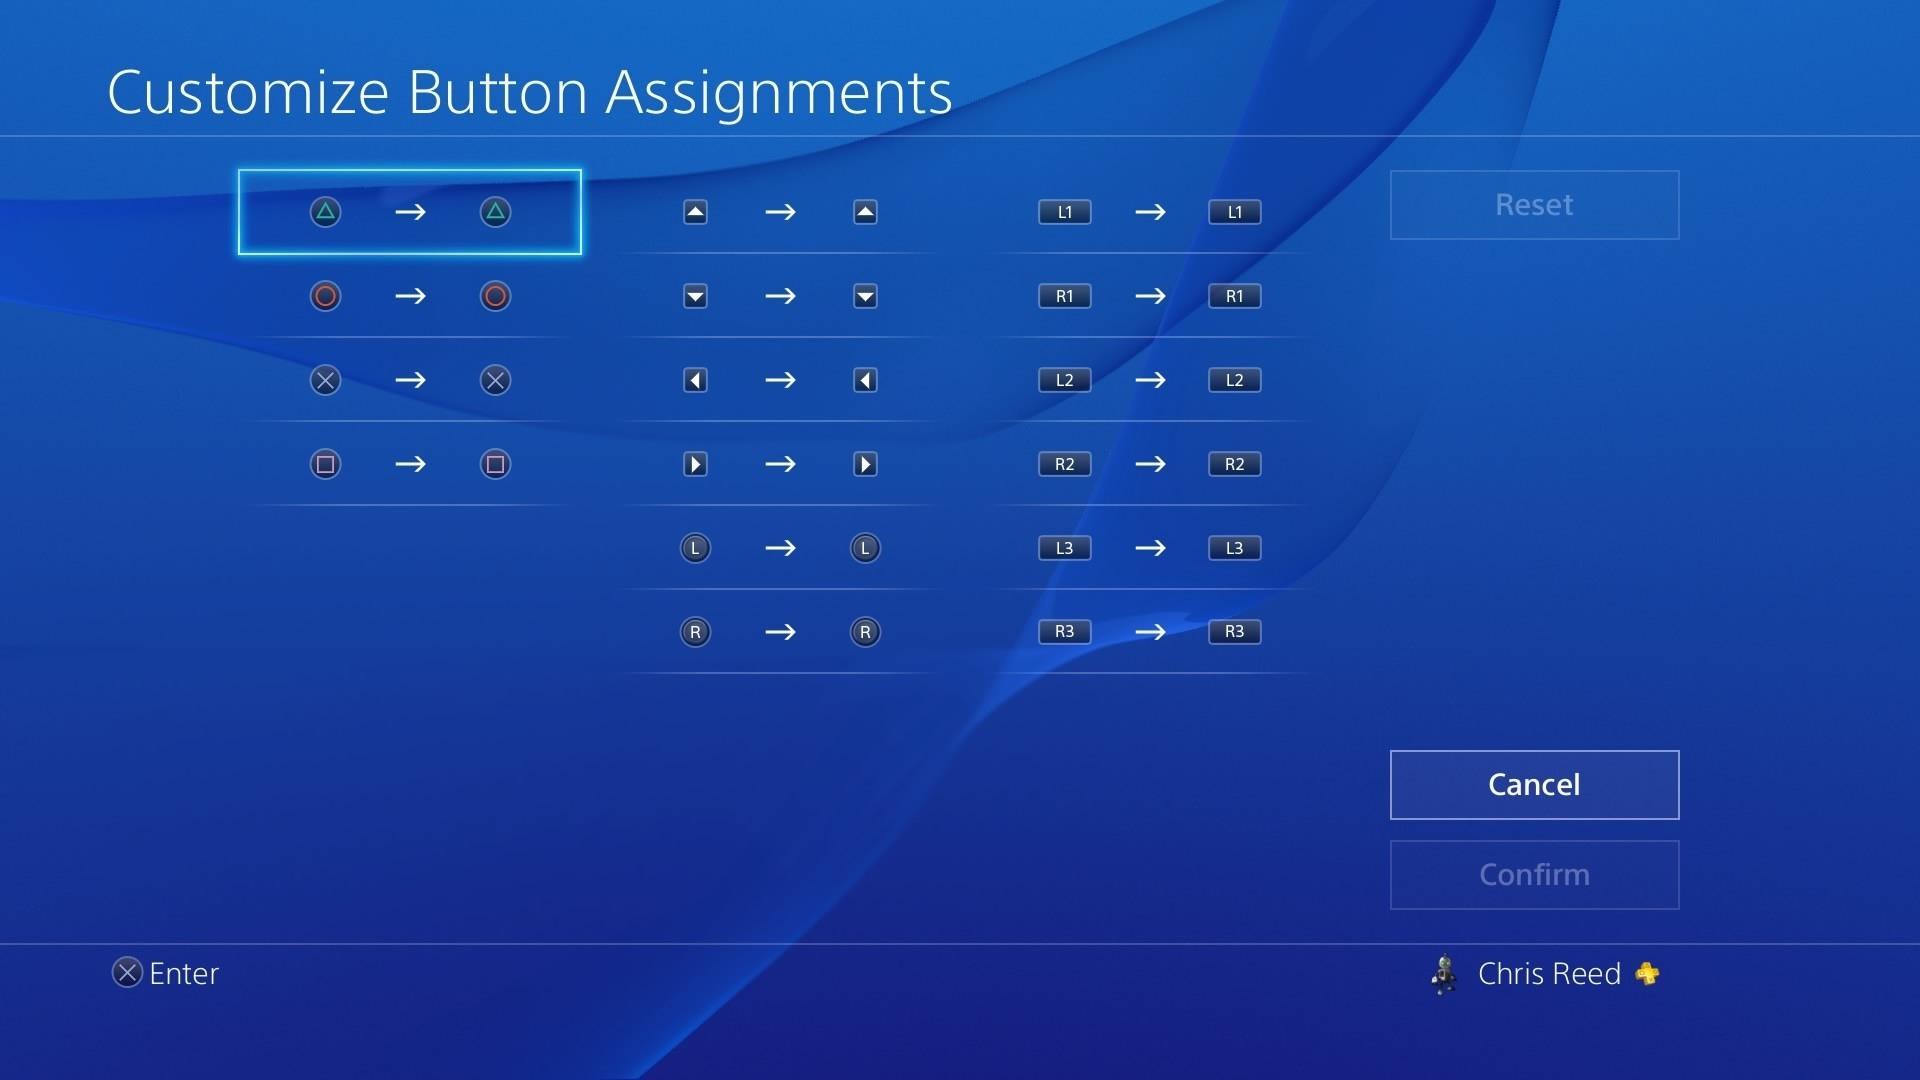 PS4 customize buttons screen.